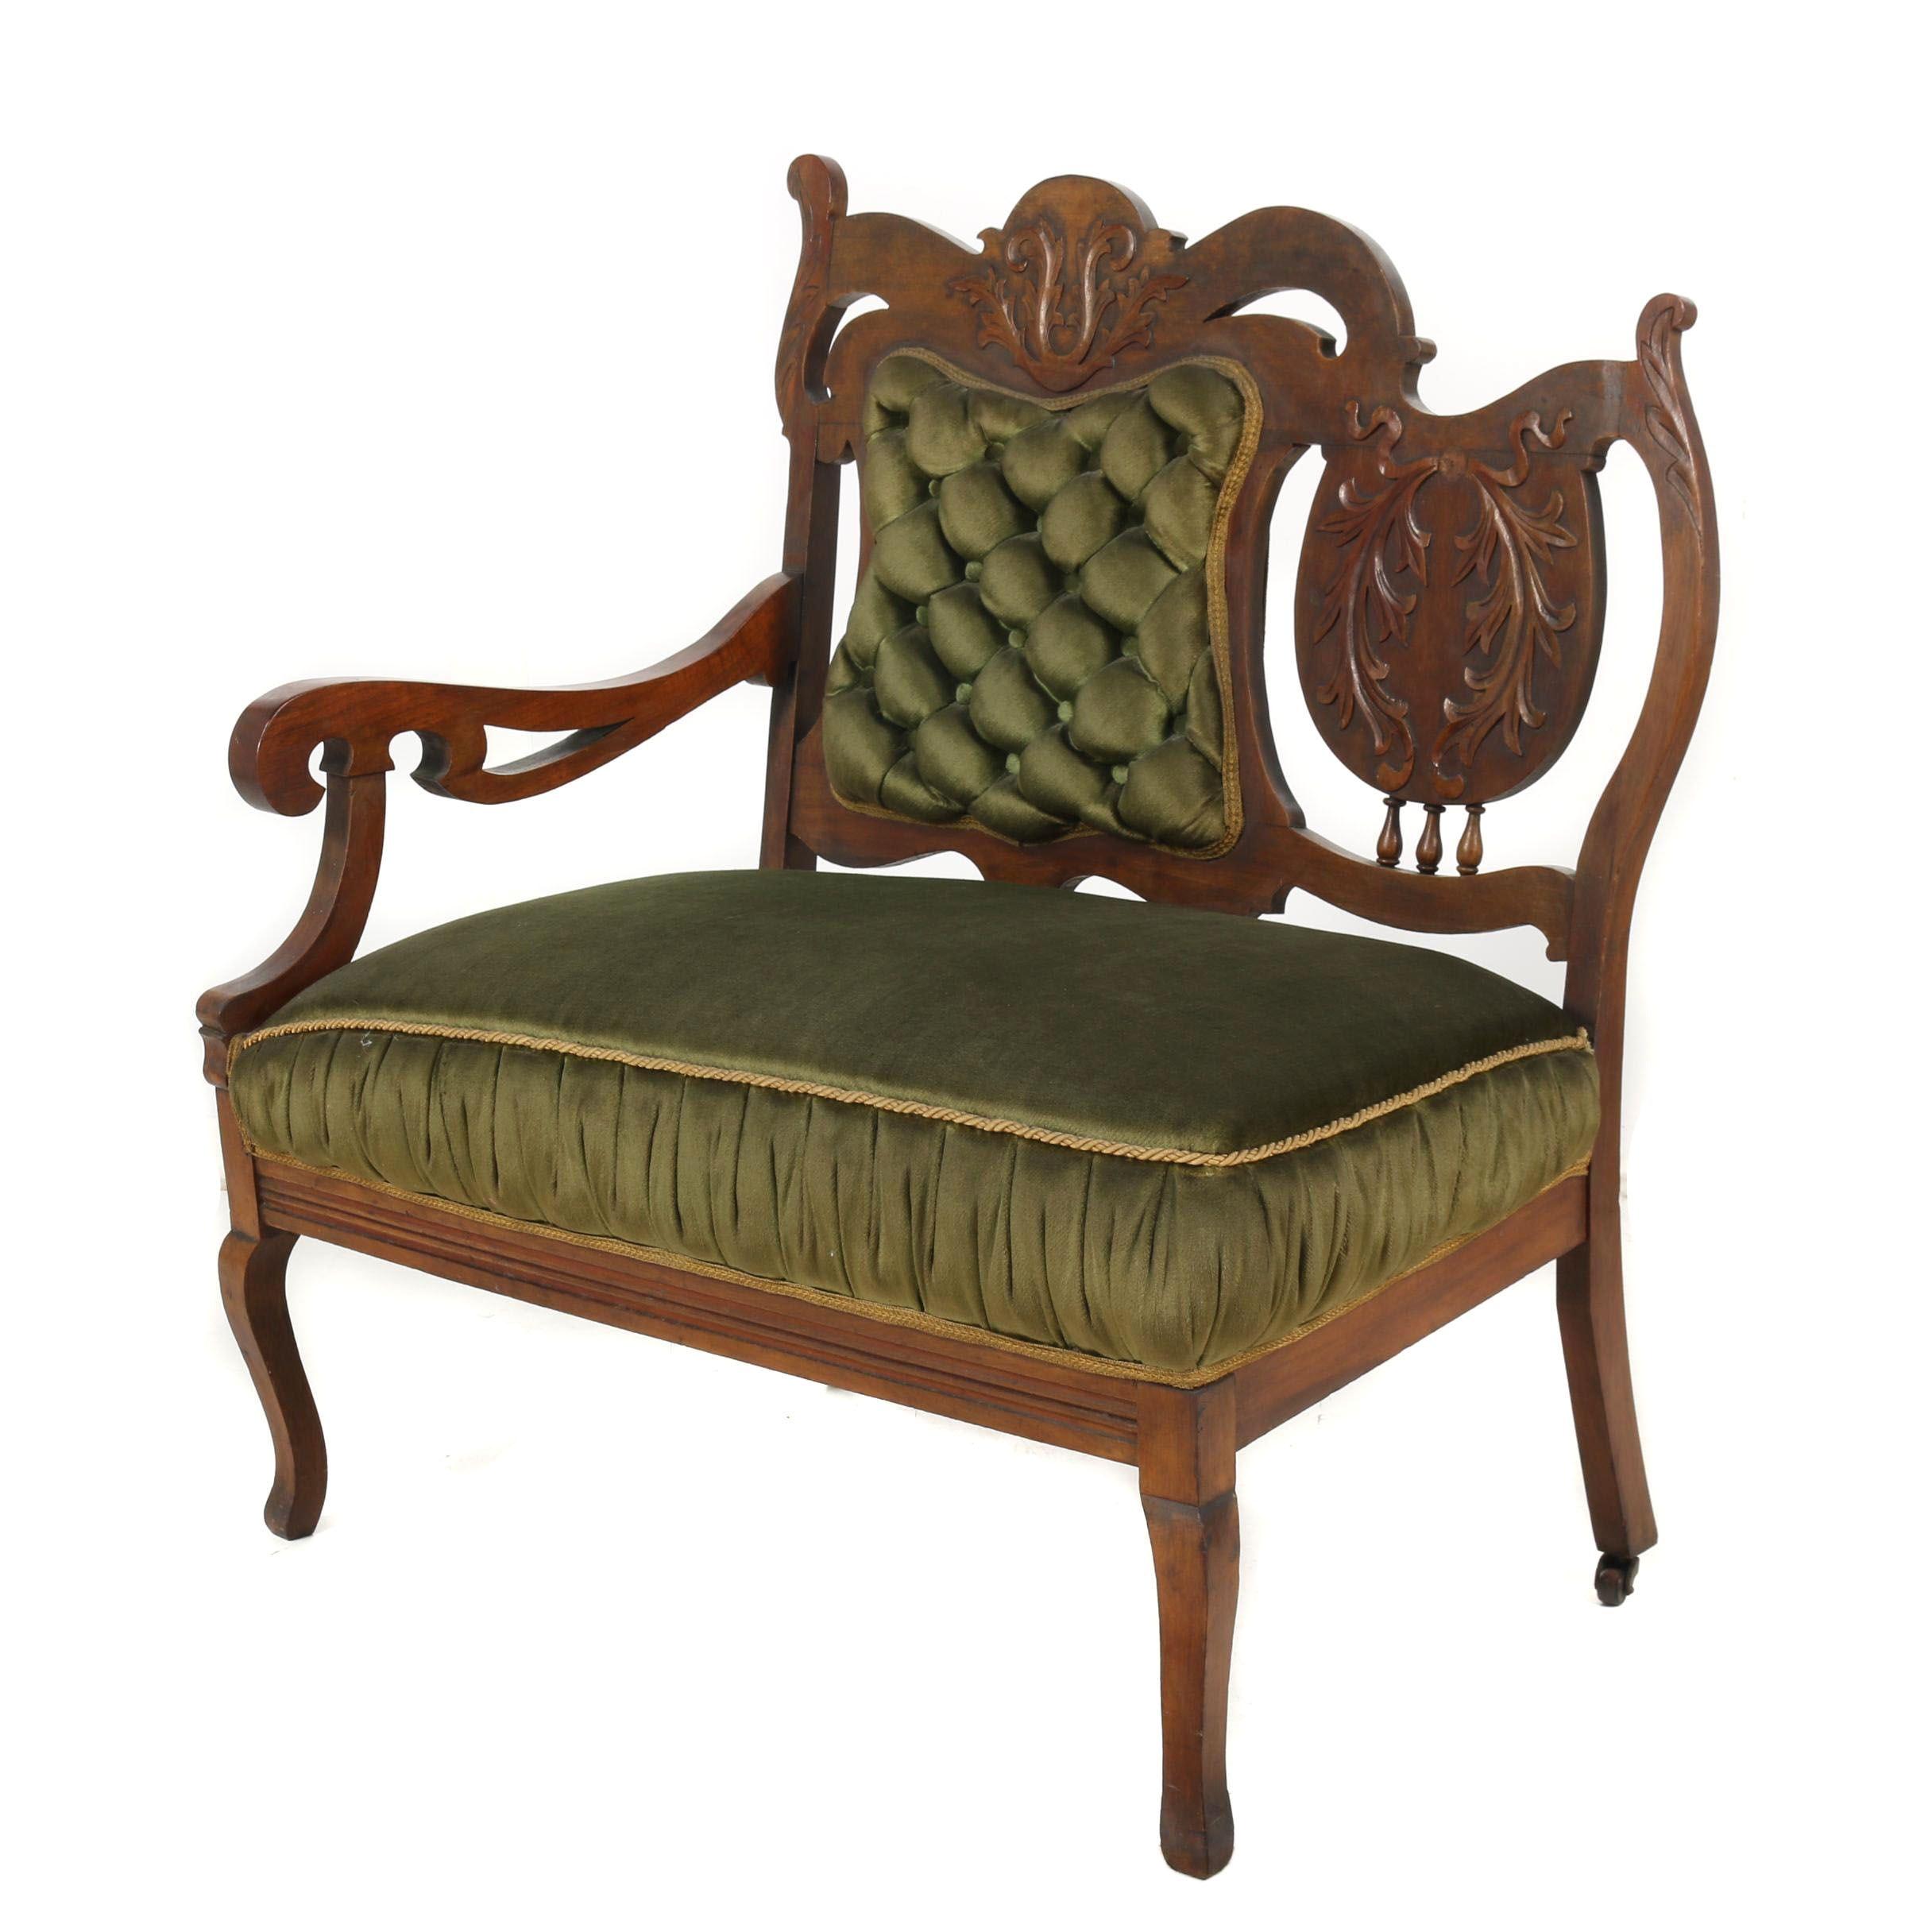 Eastlake Victorian Carved Walnut Frame Upholstered Bench, 19th Century